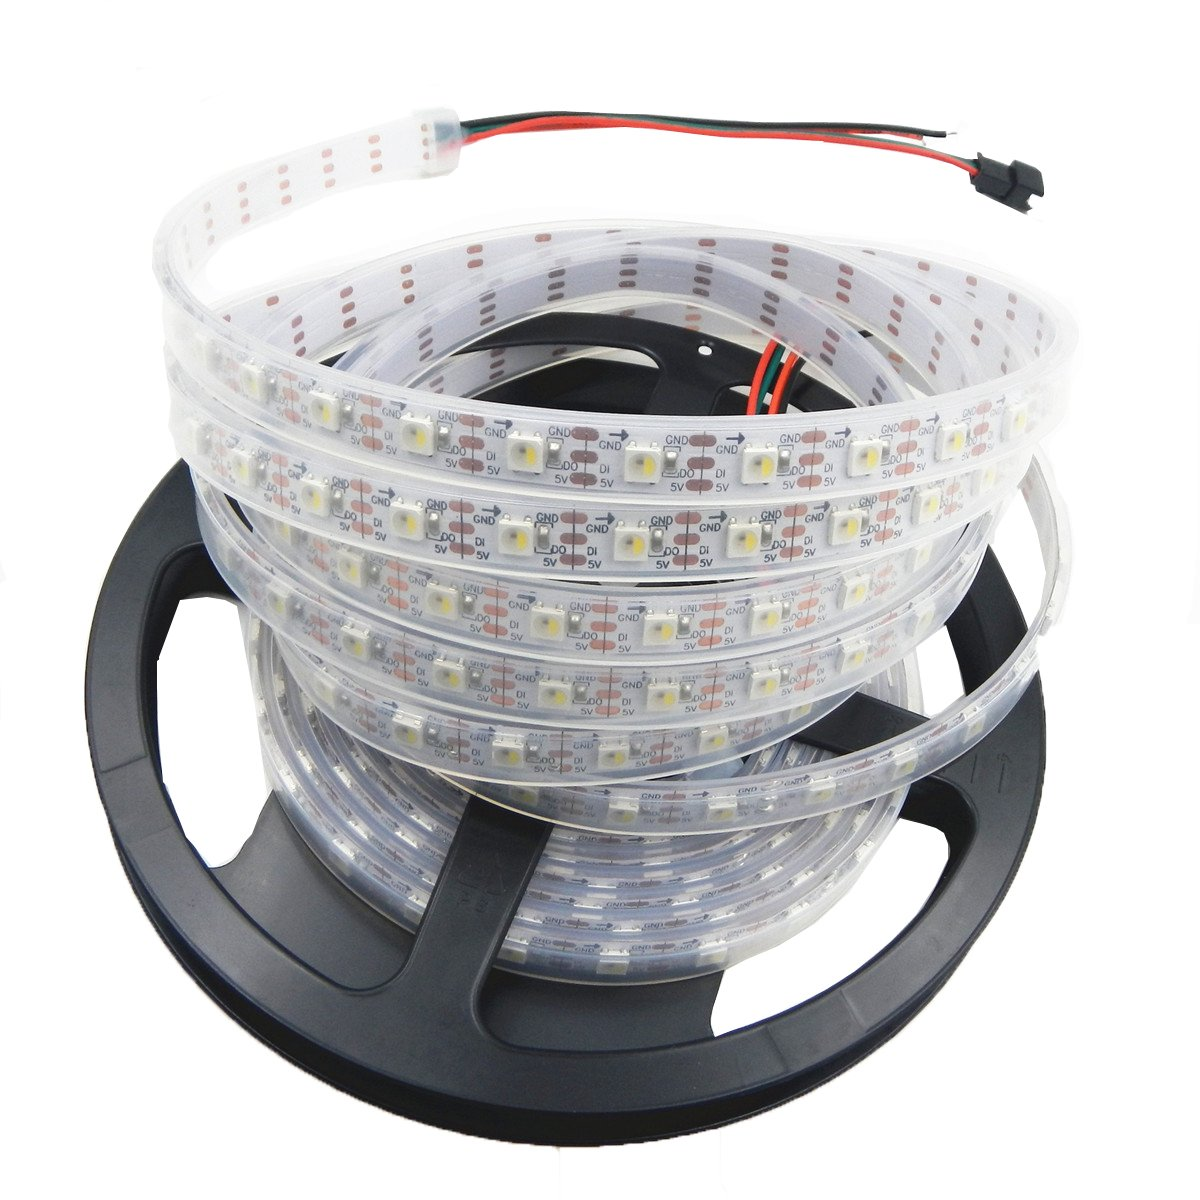 Visdoll 16.4Ft ( 5M) SK6812 IC (Upgraded of WS2812B) 300 Pixels 5050 RGB+White Individually Addressable LED Strip Light Waterproof 60Leds/M DC 5V RGBW Ribbon Light (White PCB)